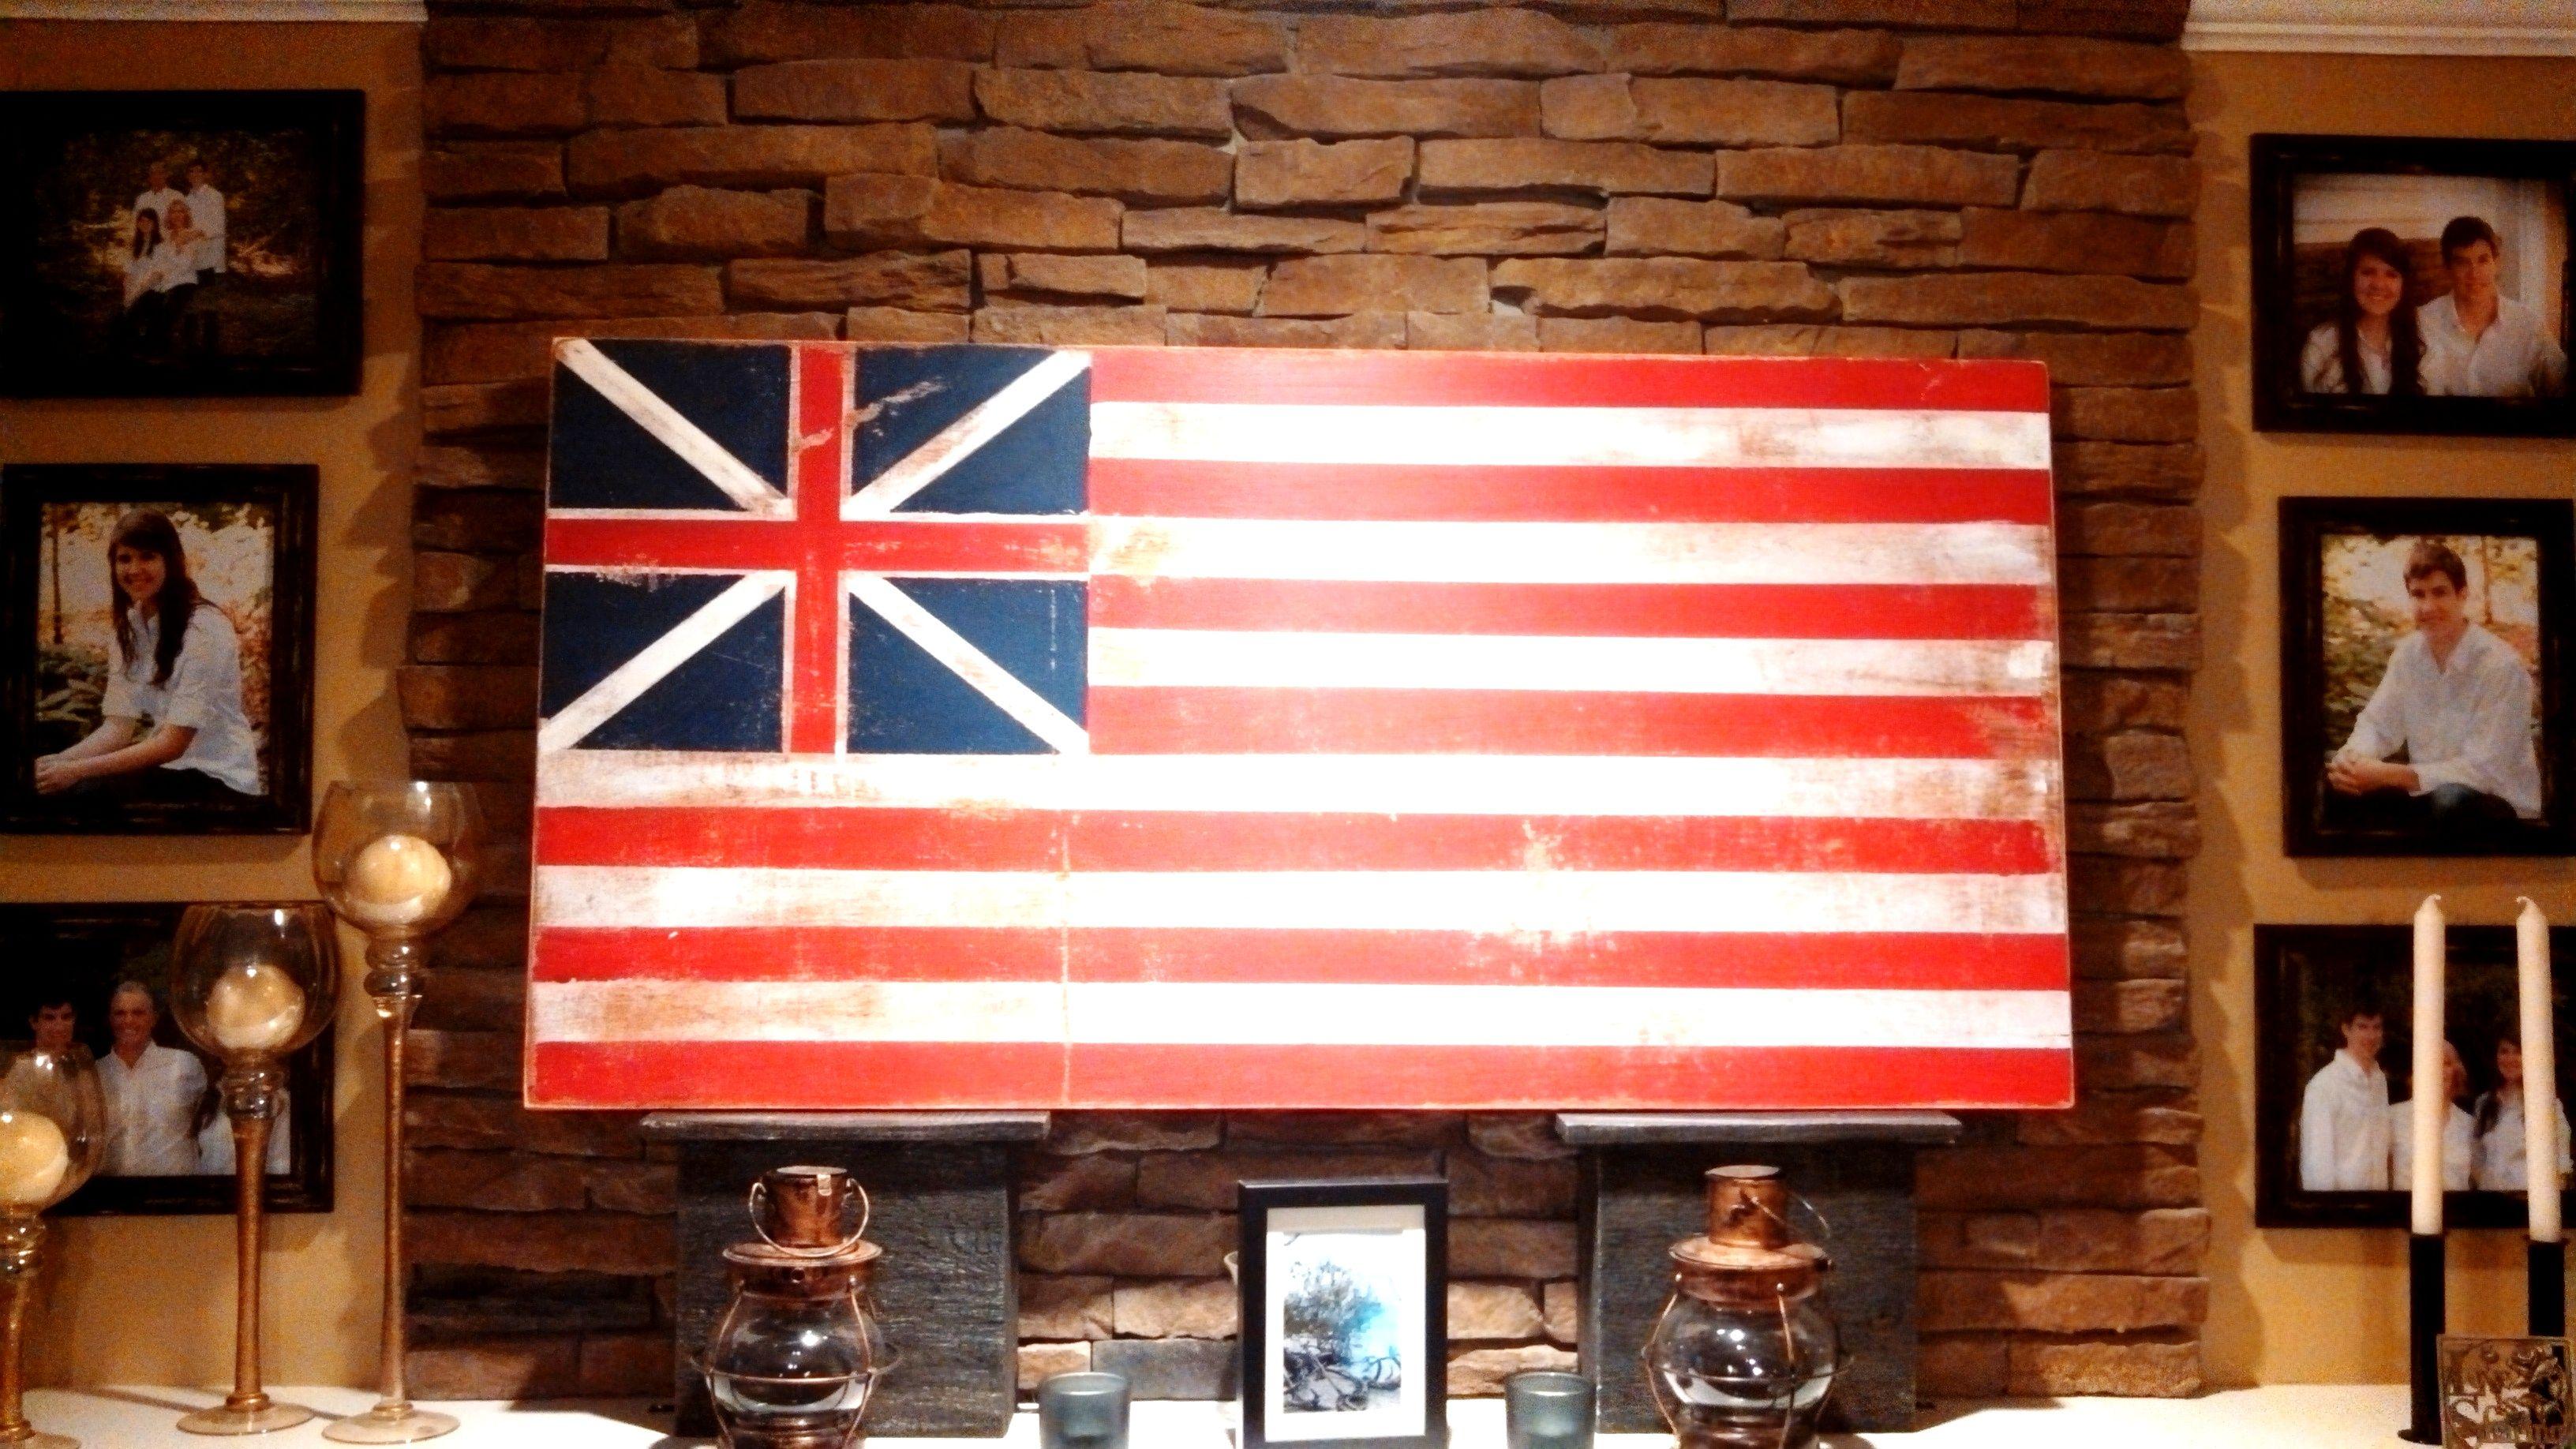 continental congress flag